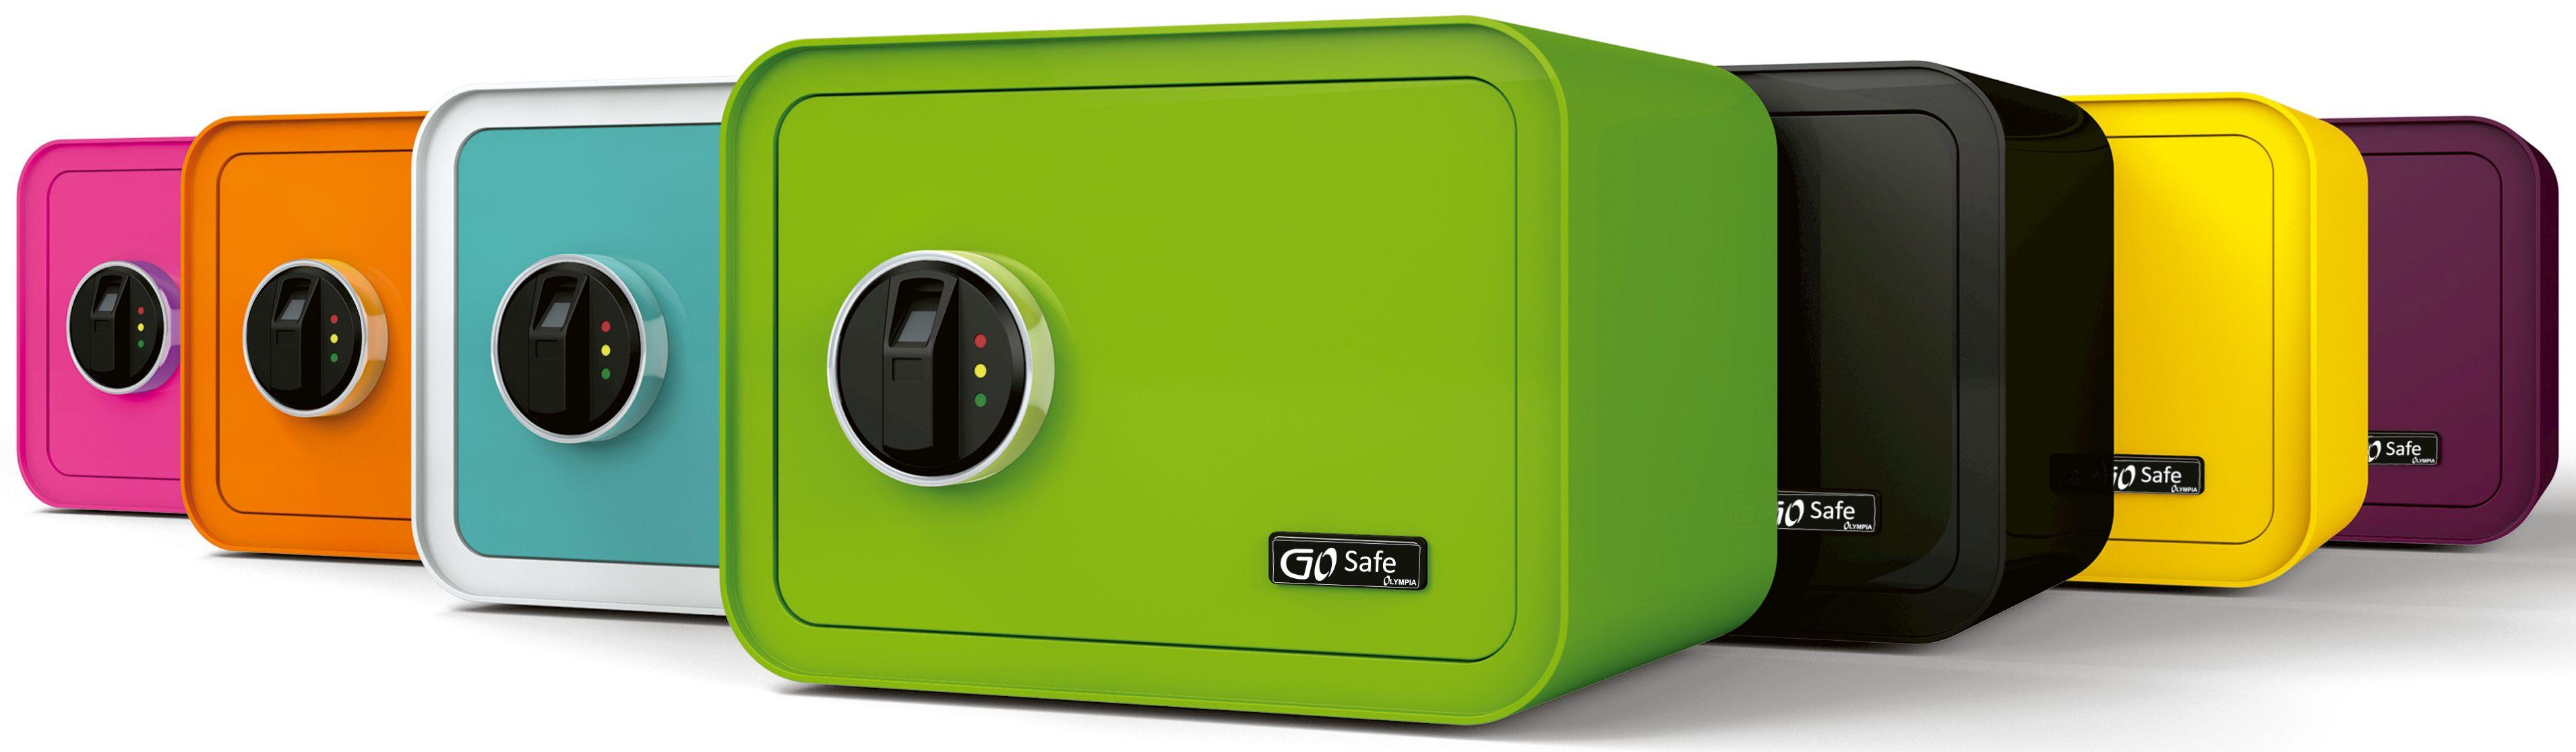 31edac2088a Produkter - enetto.com Olympia